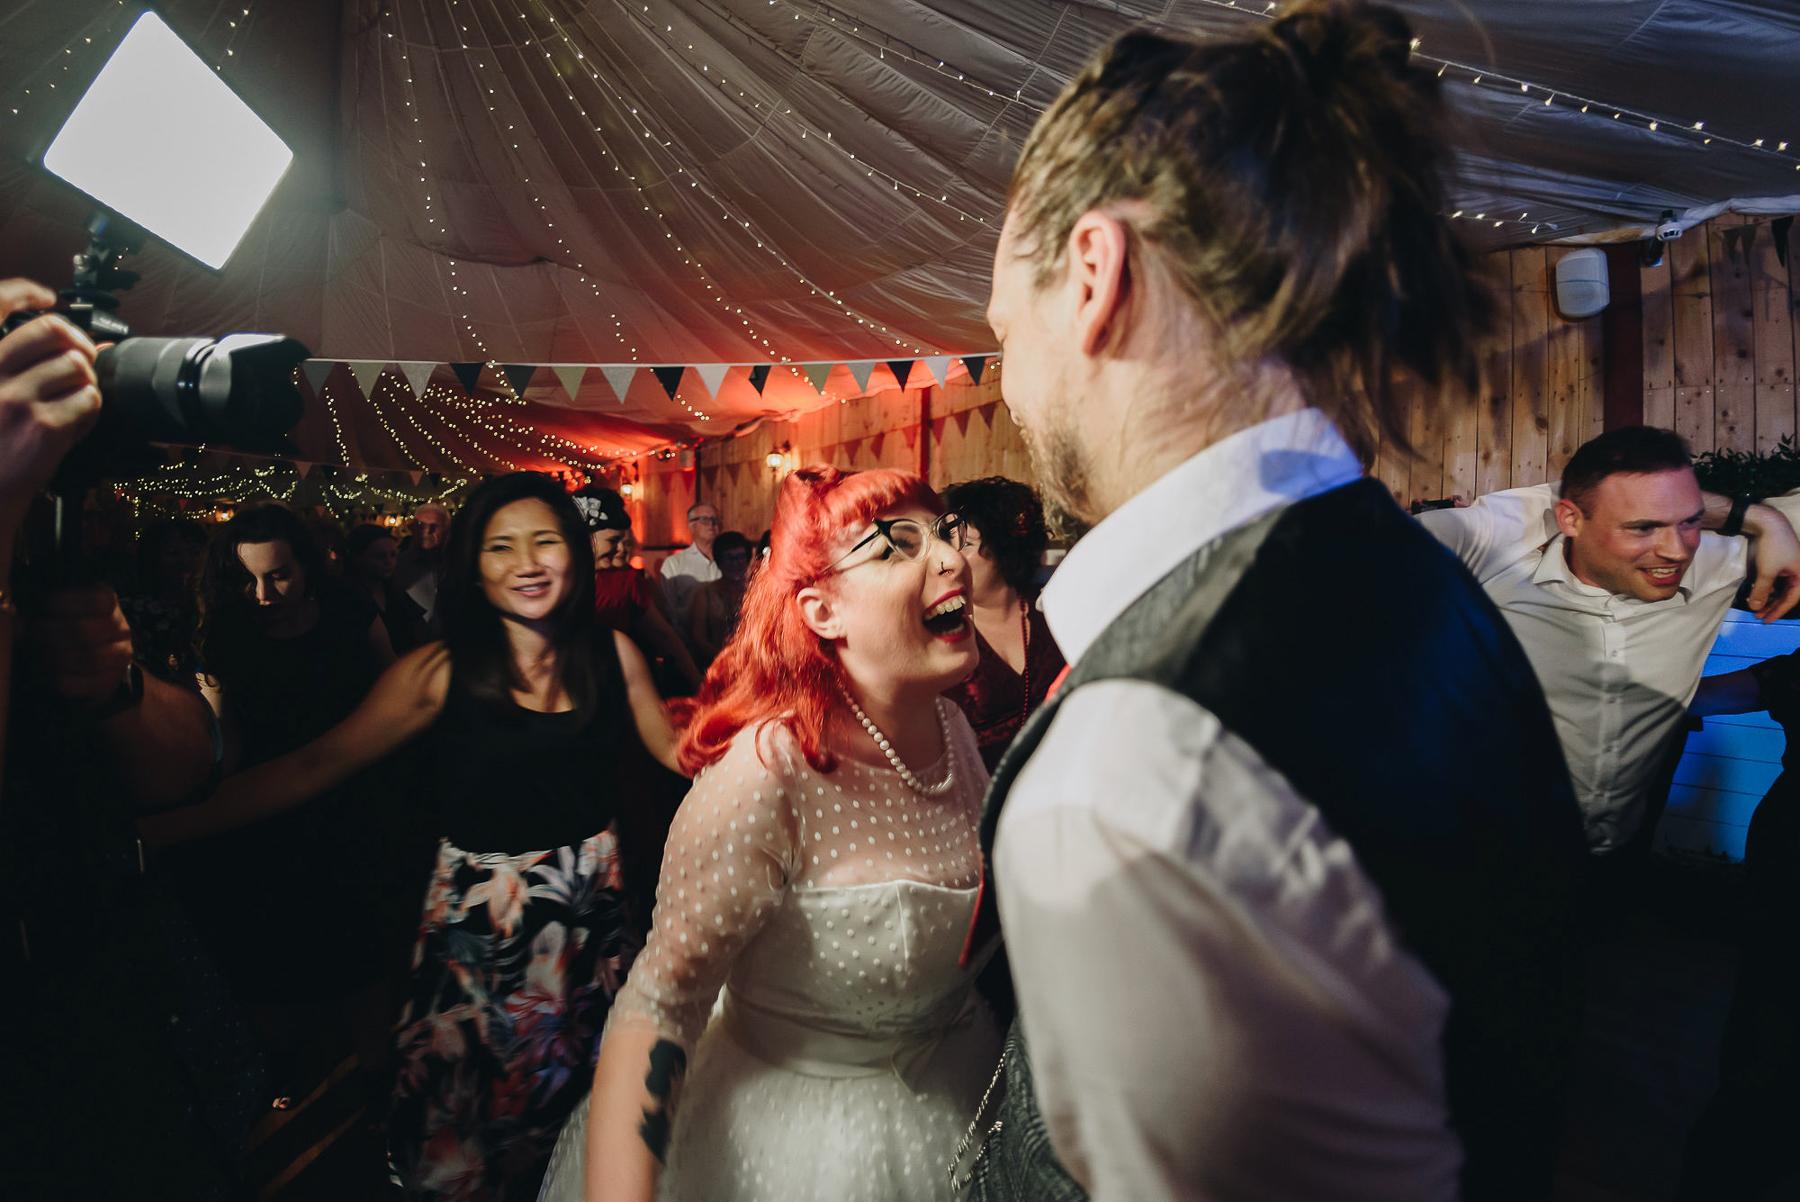 Wellbeing_Farm_Wedding_Photography_The_Pin-Up_Bride_Lara_Shaun-175.jpg